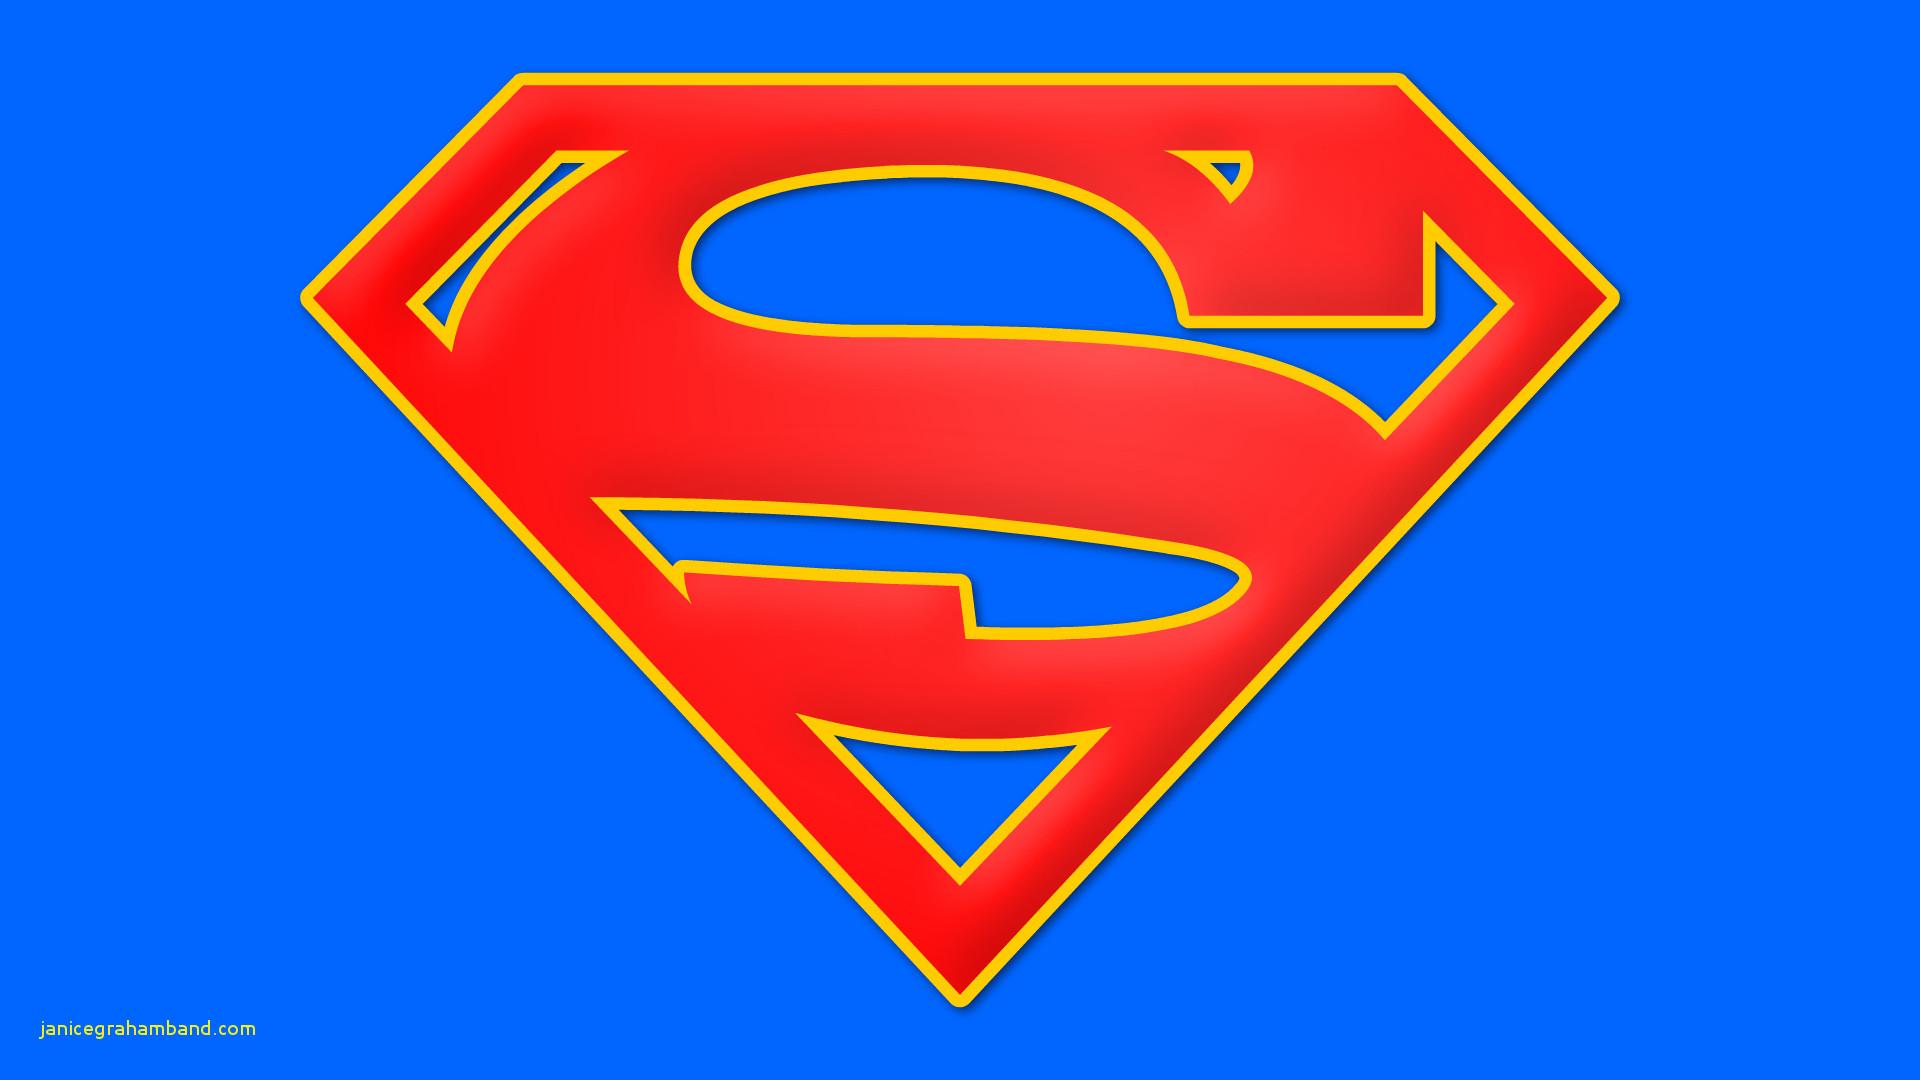 1920x1080 Supergirl Logo Vector Unique Supergirl Symbol By Yurtigo On